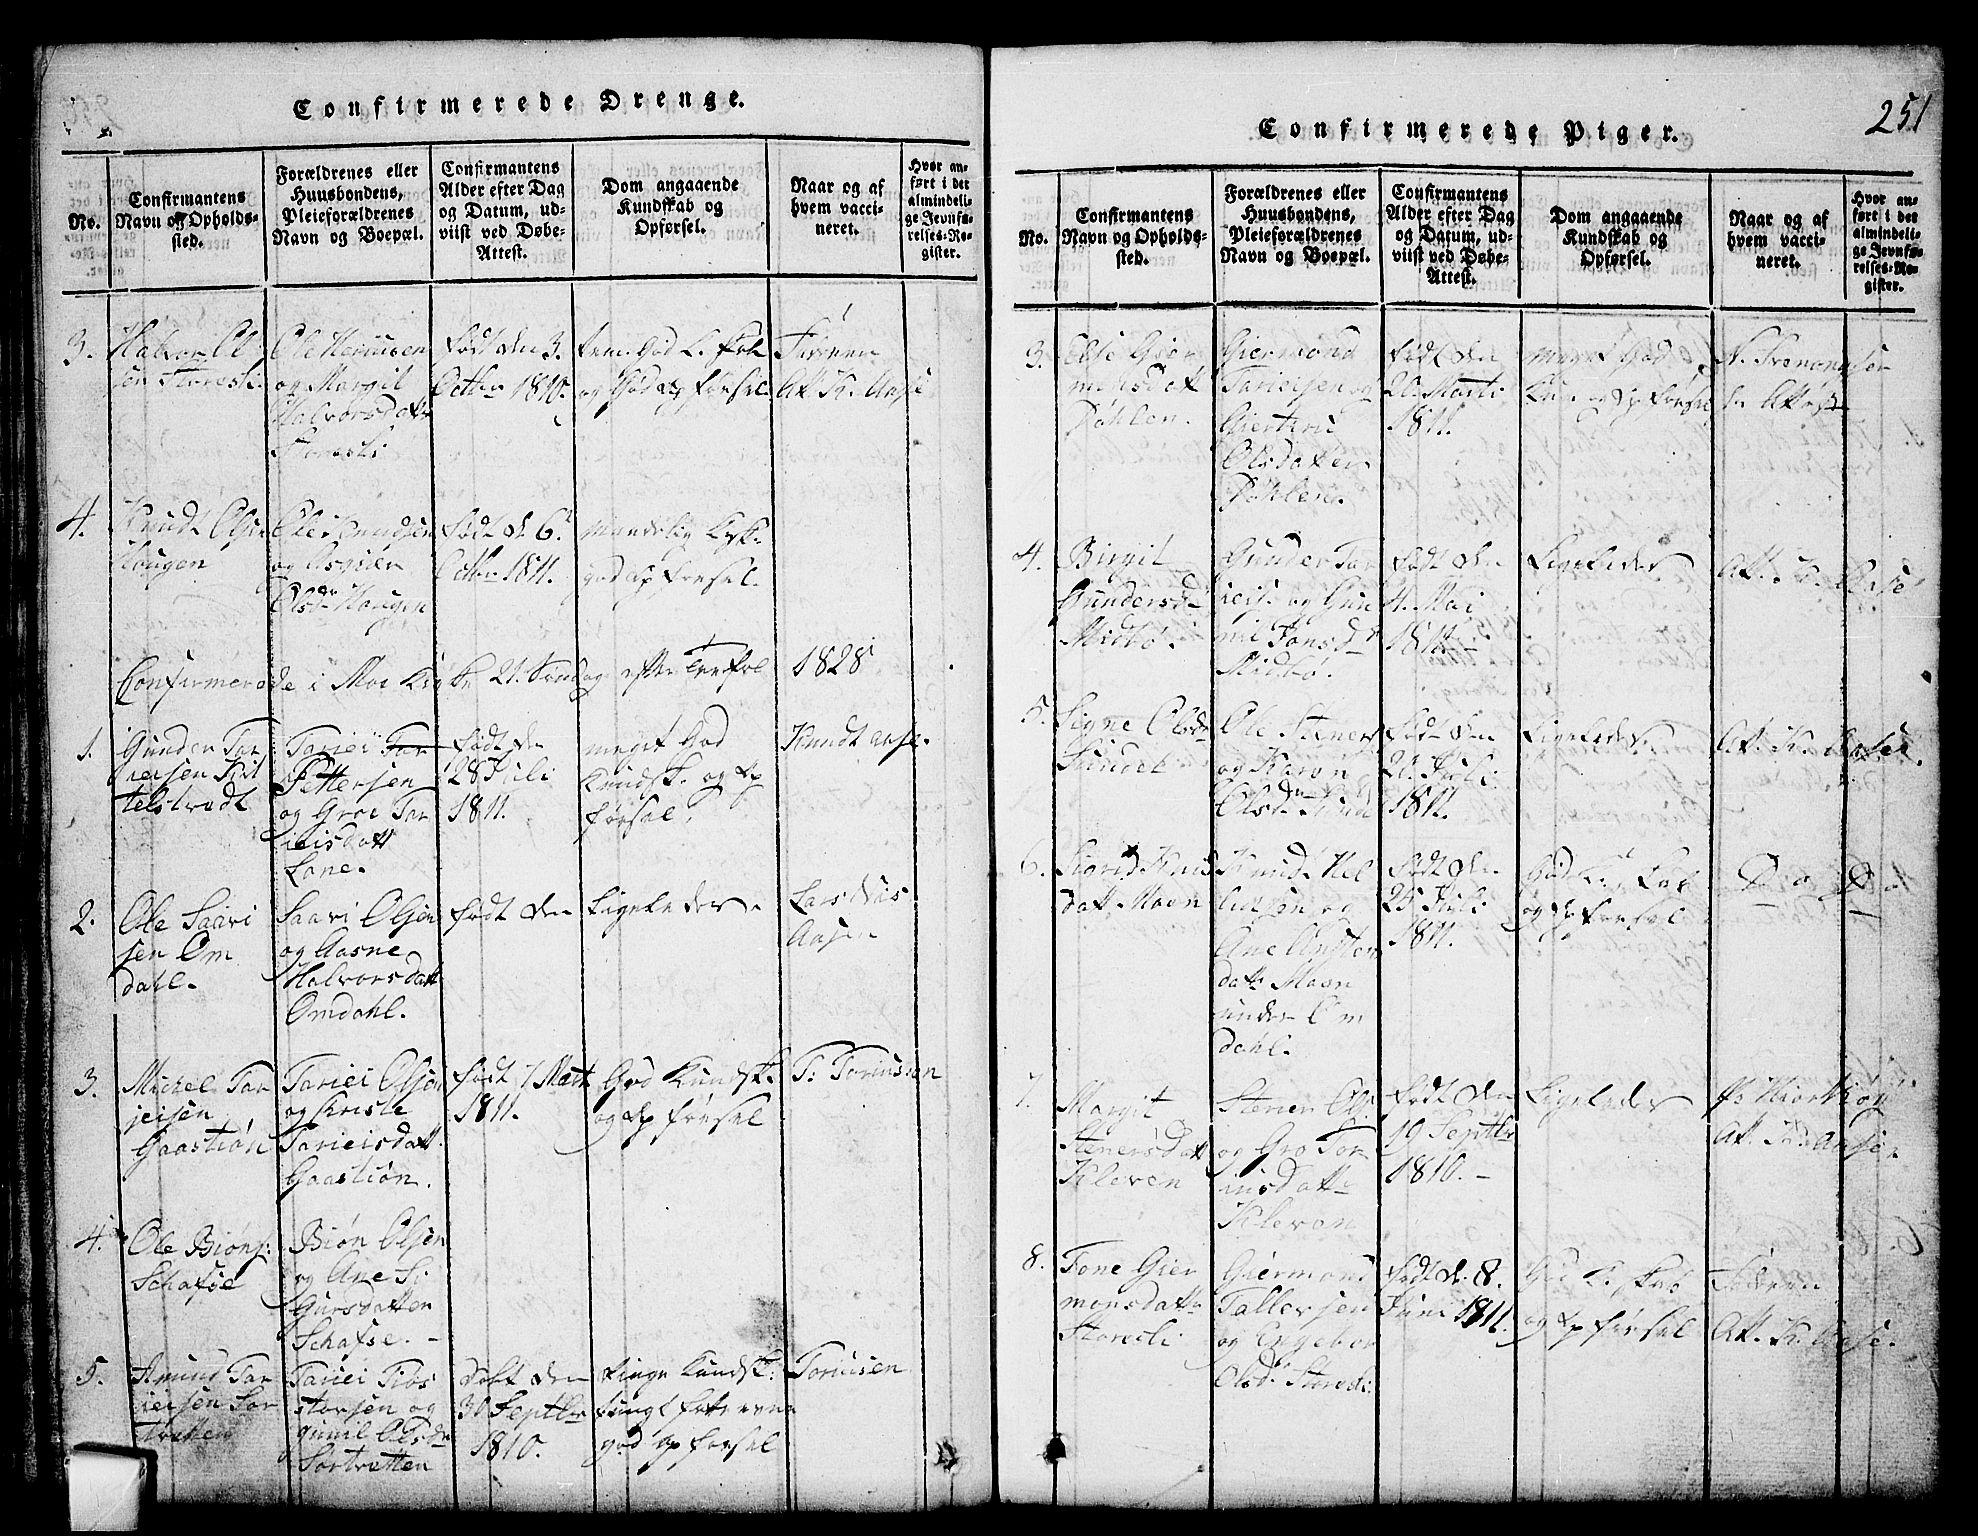 SAKO, Mo kirkebøker, G/Gb/L0001: Klokkerbok nr. II 1, 1814-1843, s. 251